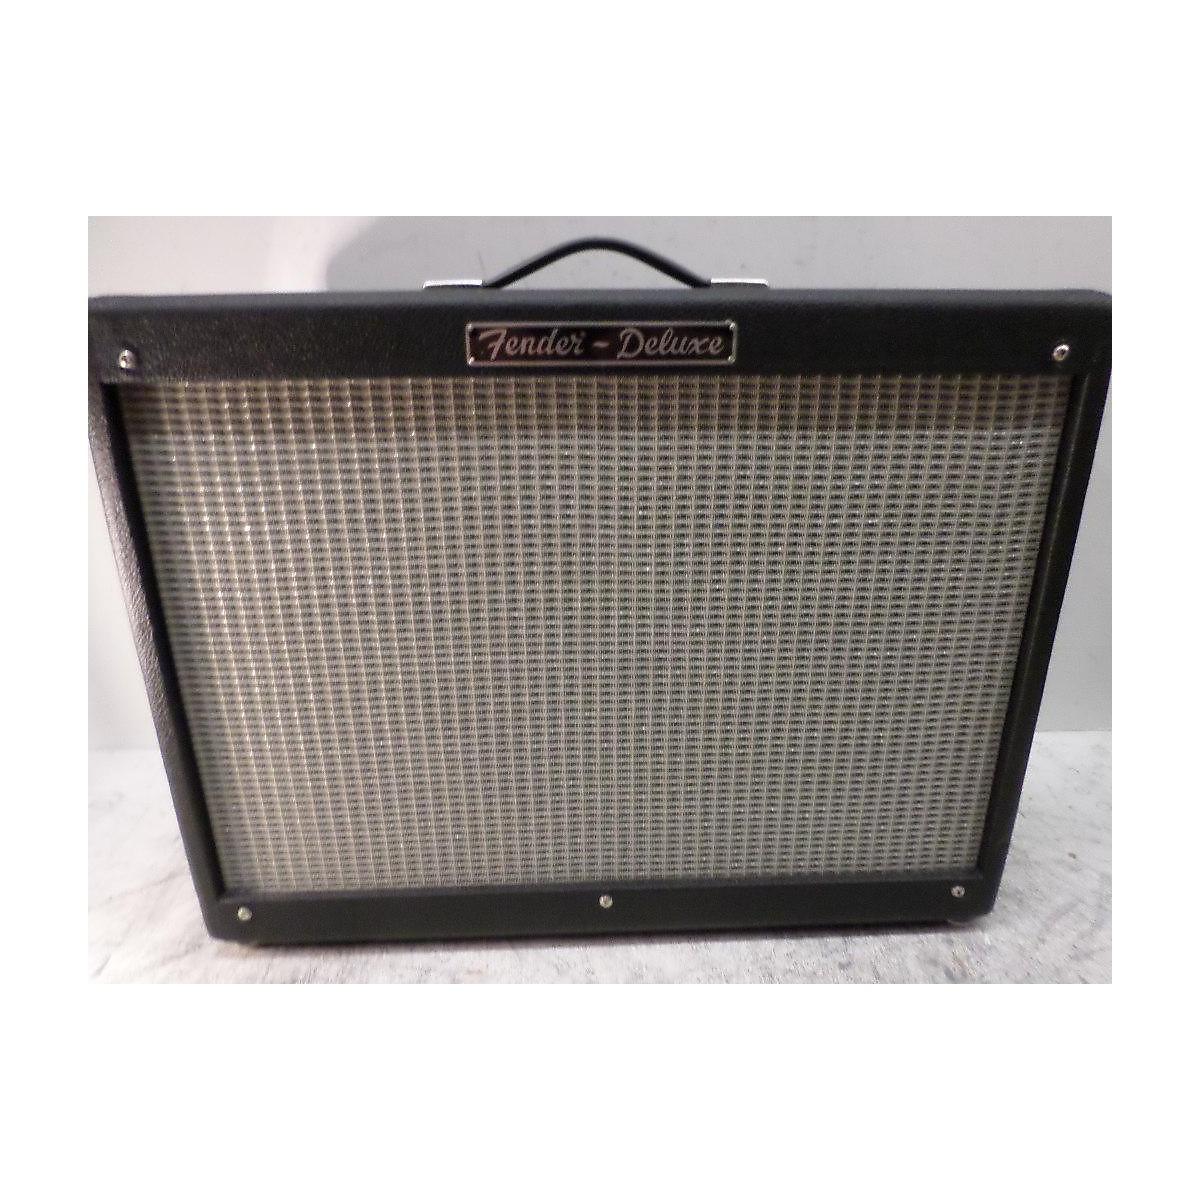 Fender HOT ROD DELUXE 1X12 ENCLOSURE GUITAR CABINET Guitar Cabinet